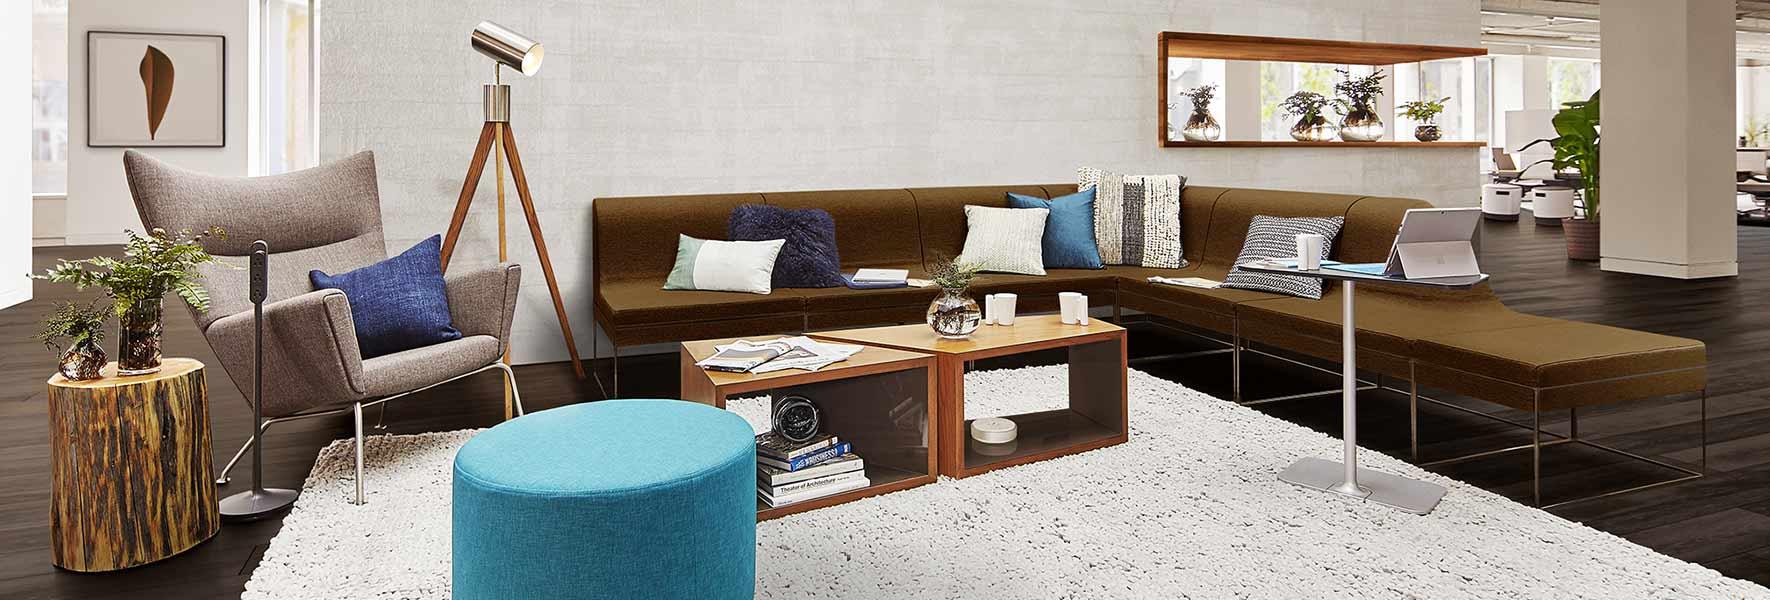 A modern office lounge environment